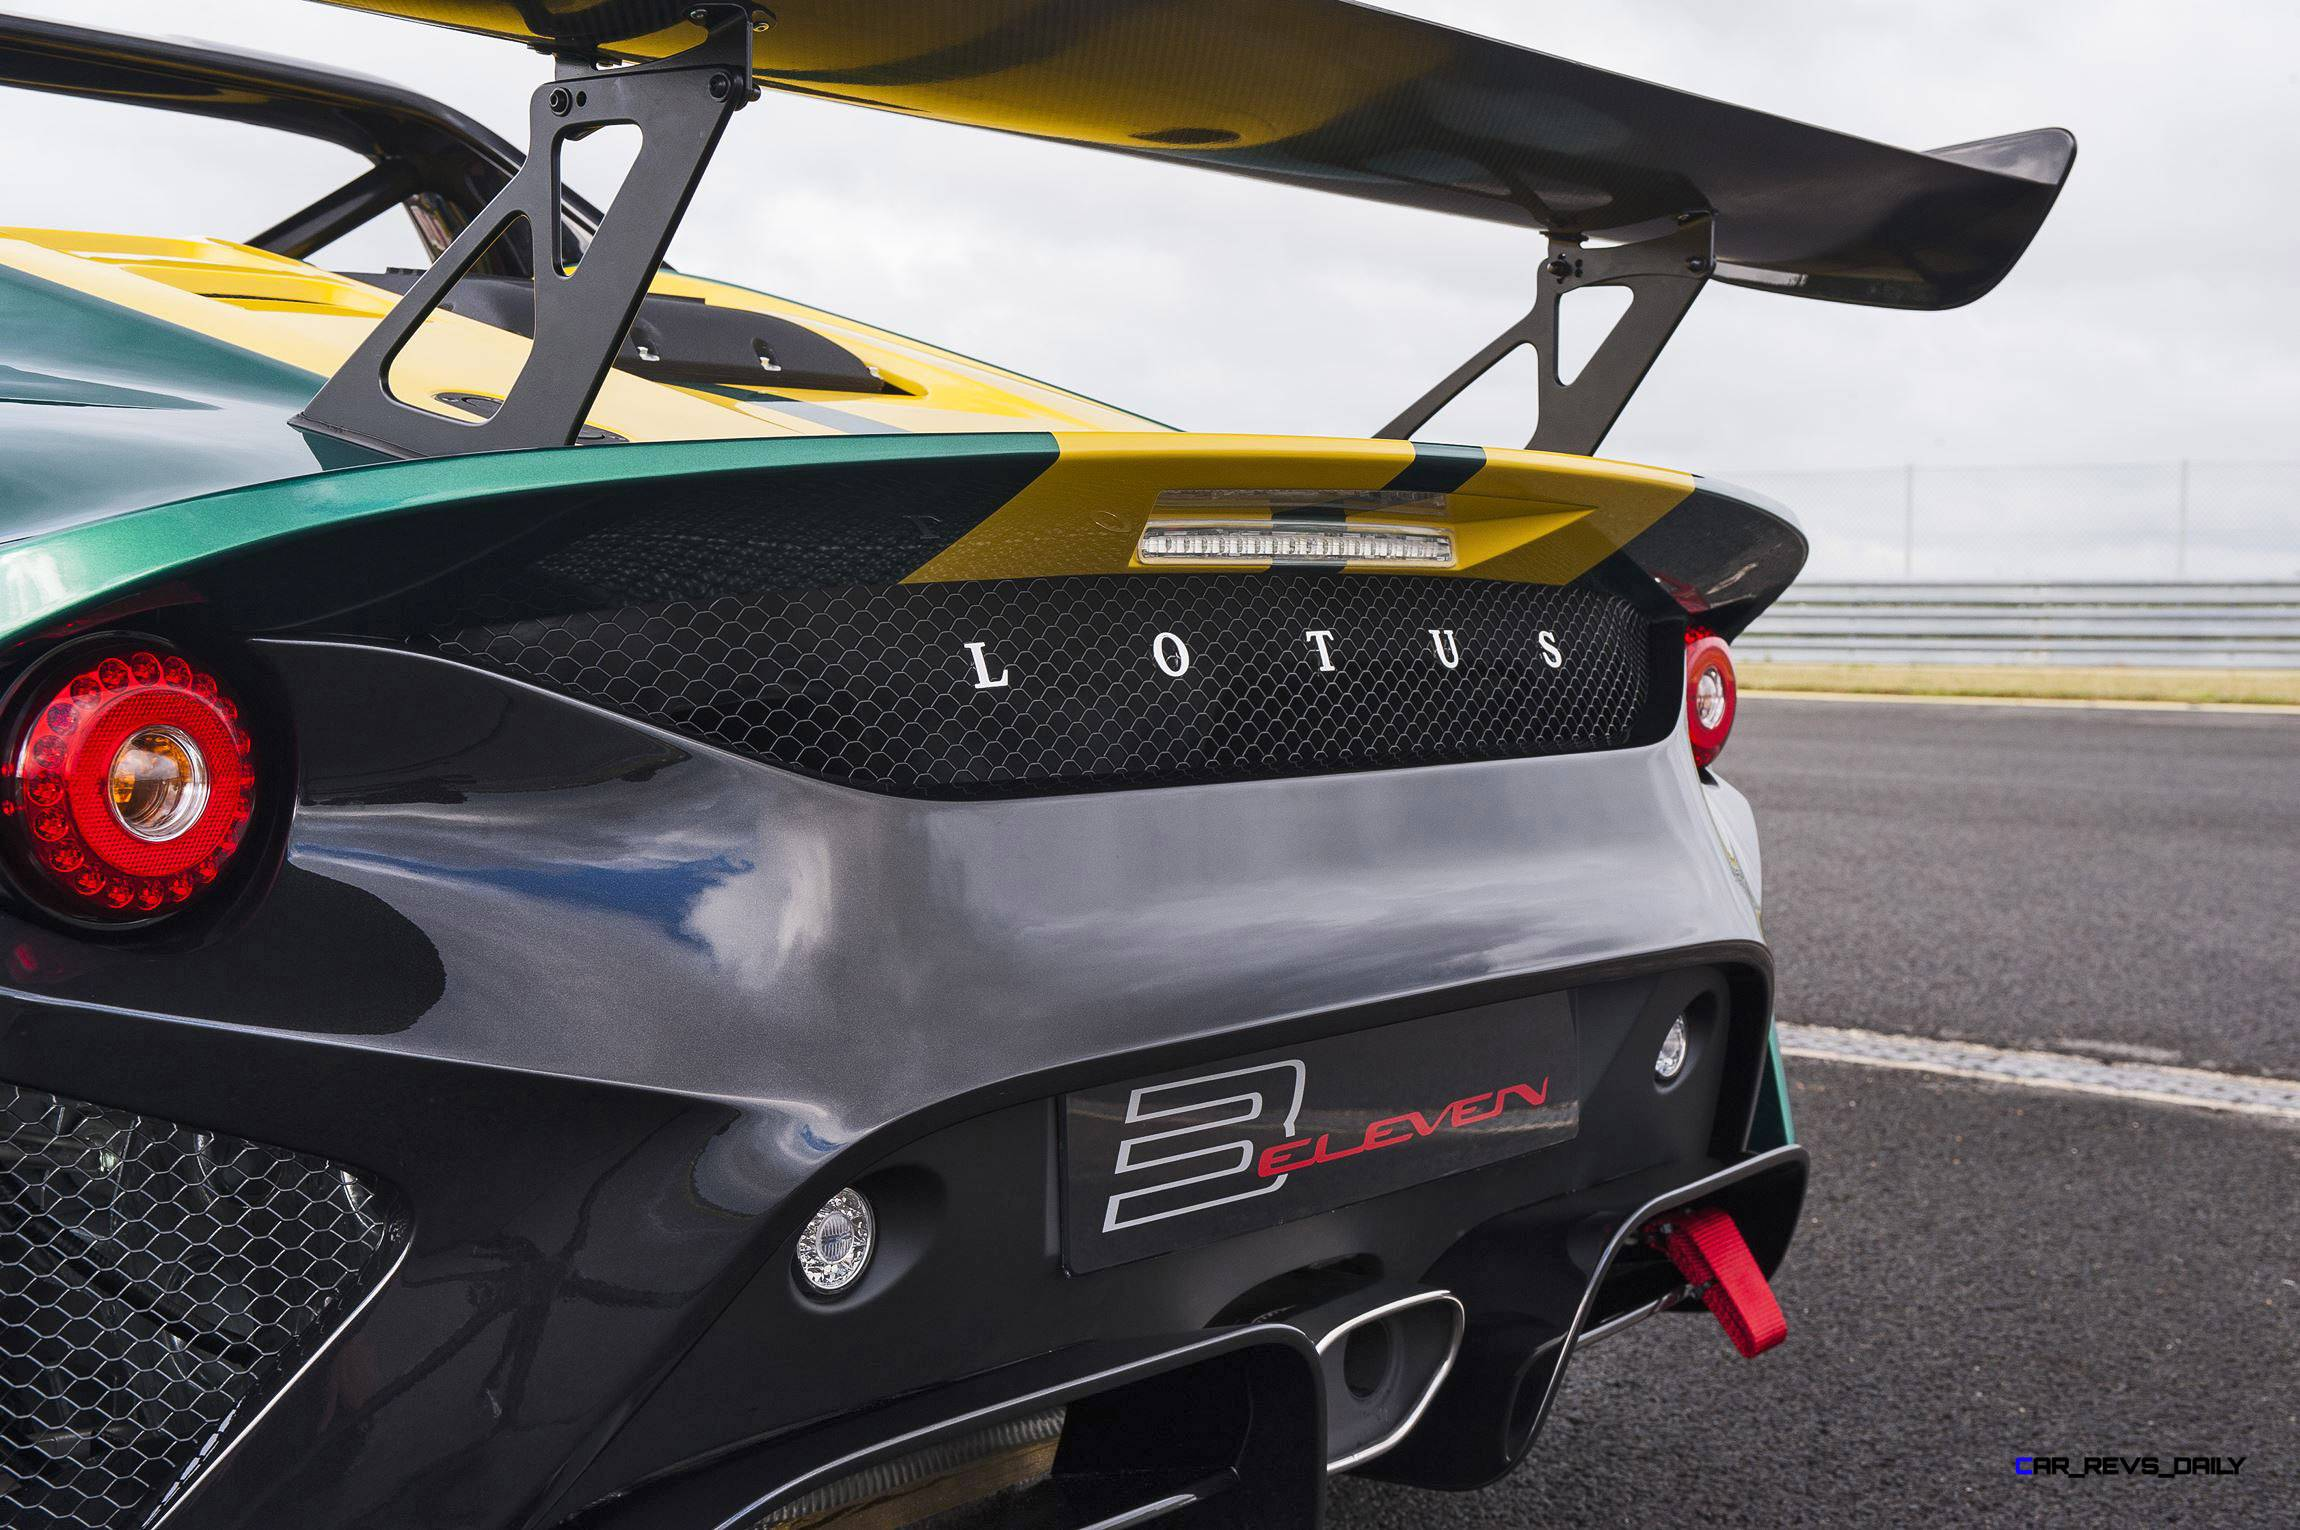 http://www.car-revs-daily.com/wp-content/uploads/2015/06/2016-Lotus-3-Eleven-5.jpg